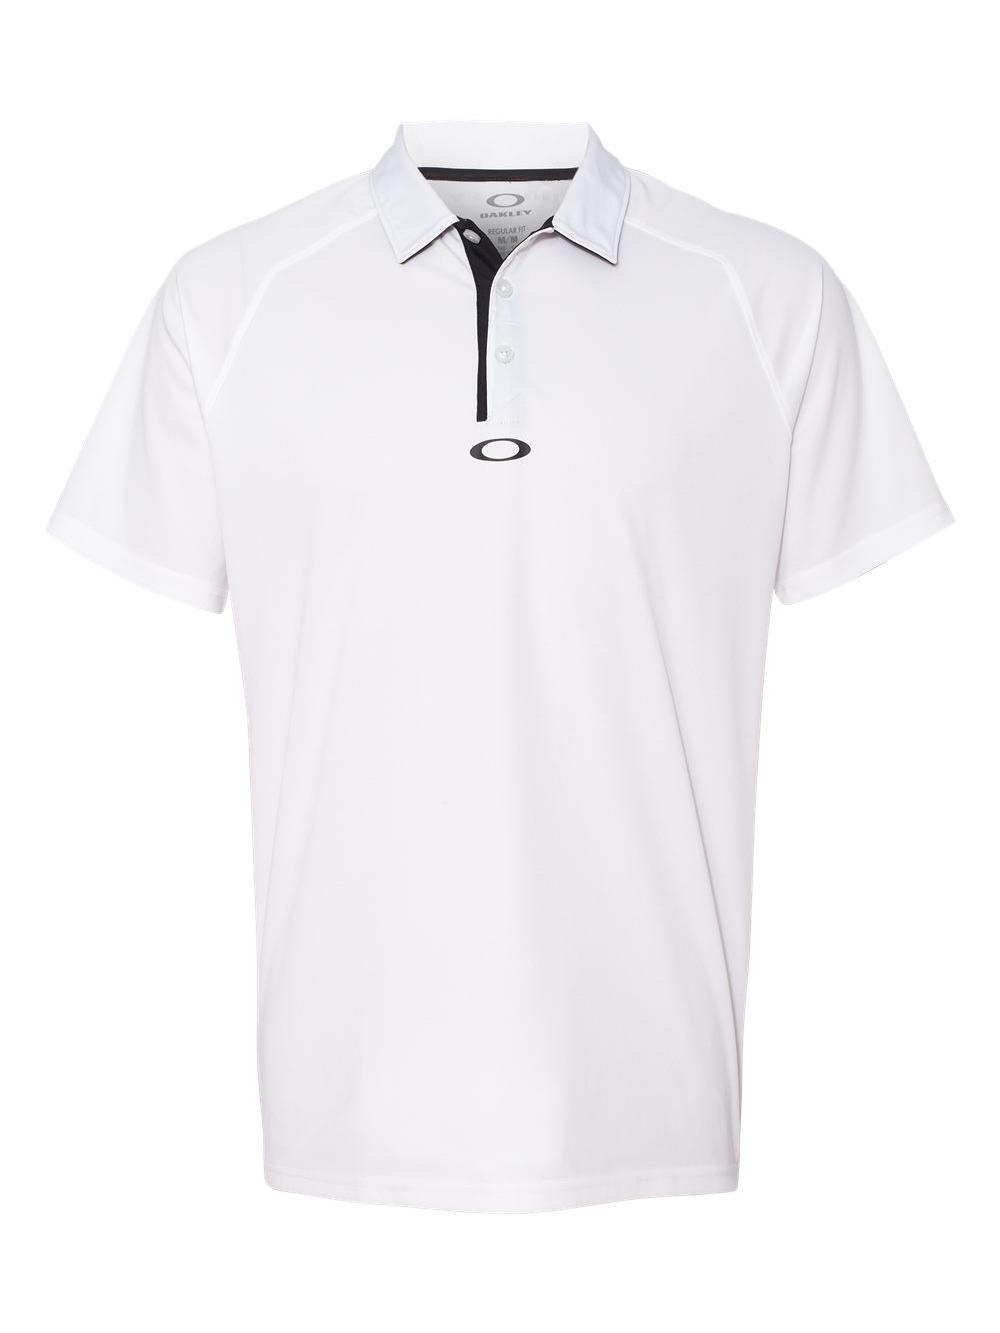 Oakley-Elemental-2-0-Sport-Shirt-432632ODM thumbnail 12